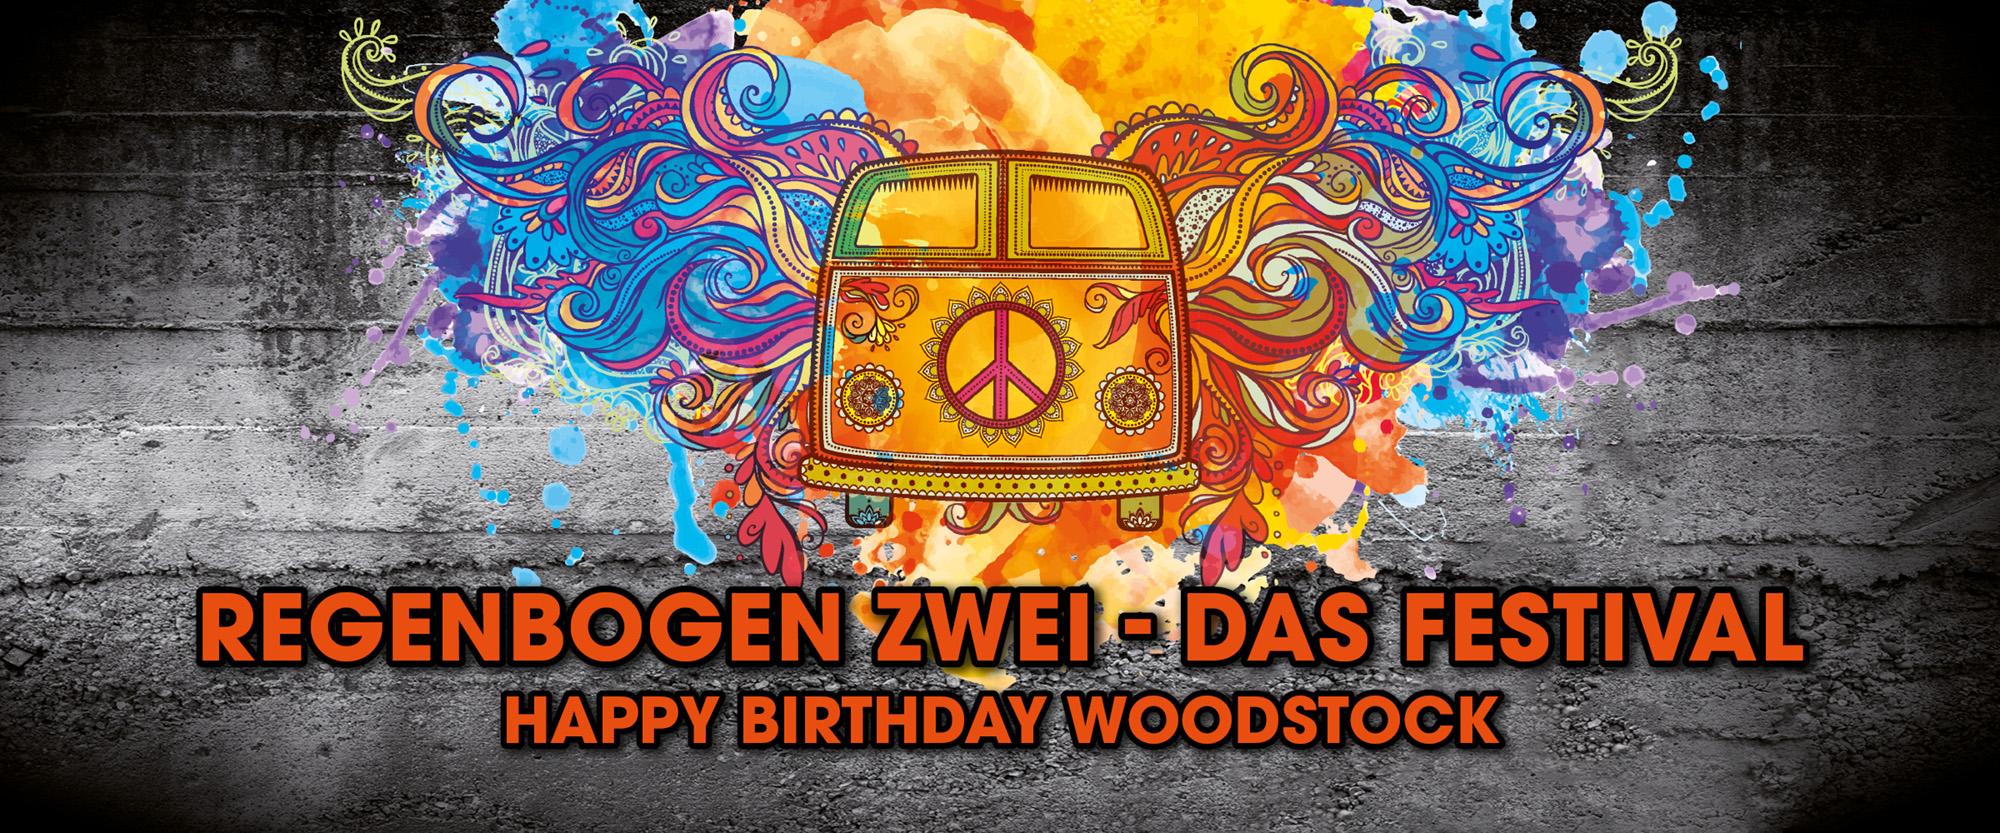 R2-HappyBirthday-Woodstock-Titel.jpg